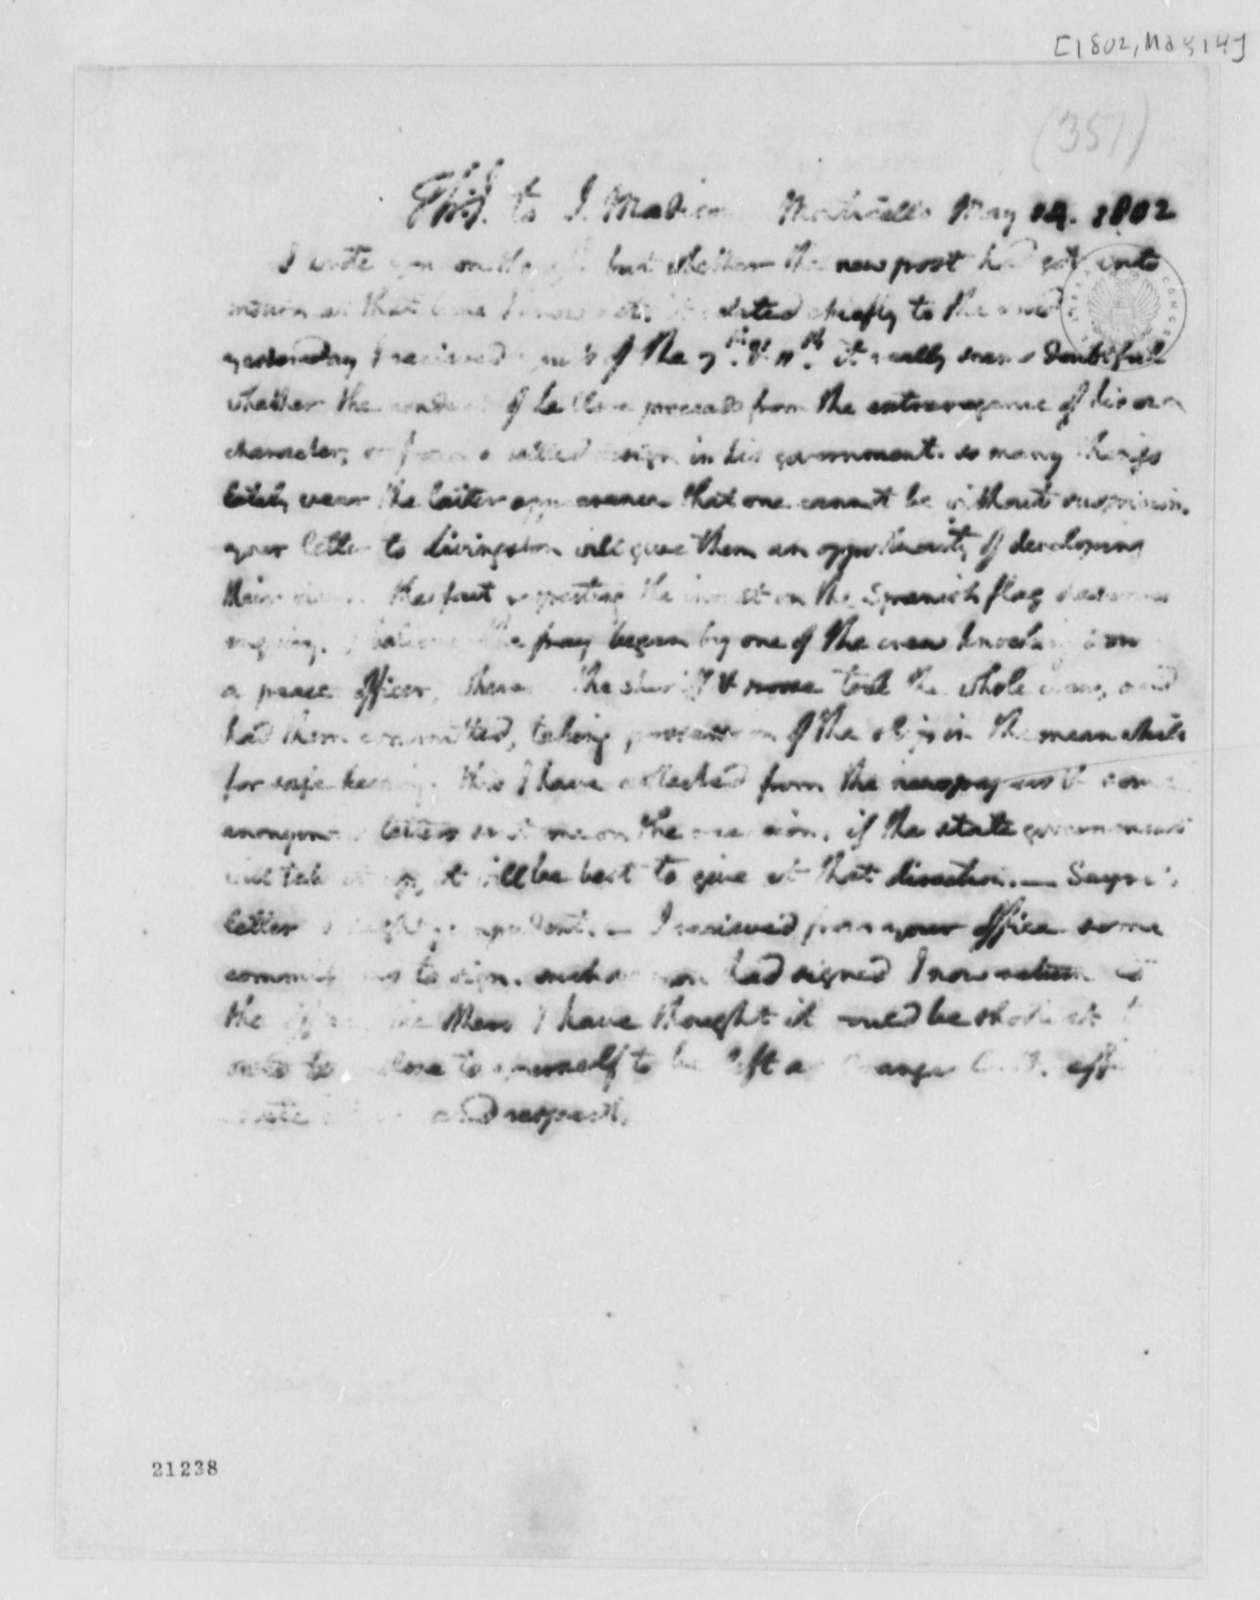 Thomas Jefferson to James Madison, May 14, 1802